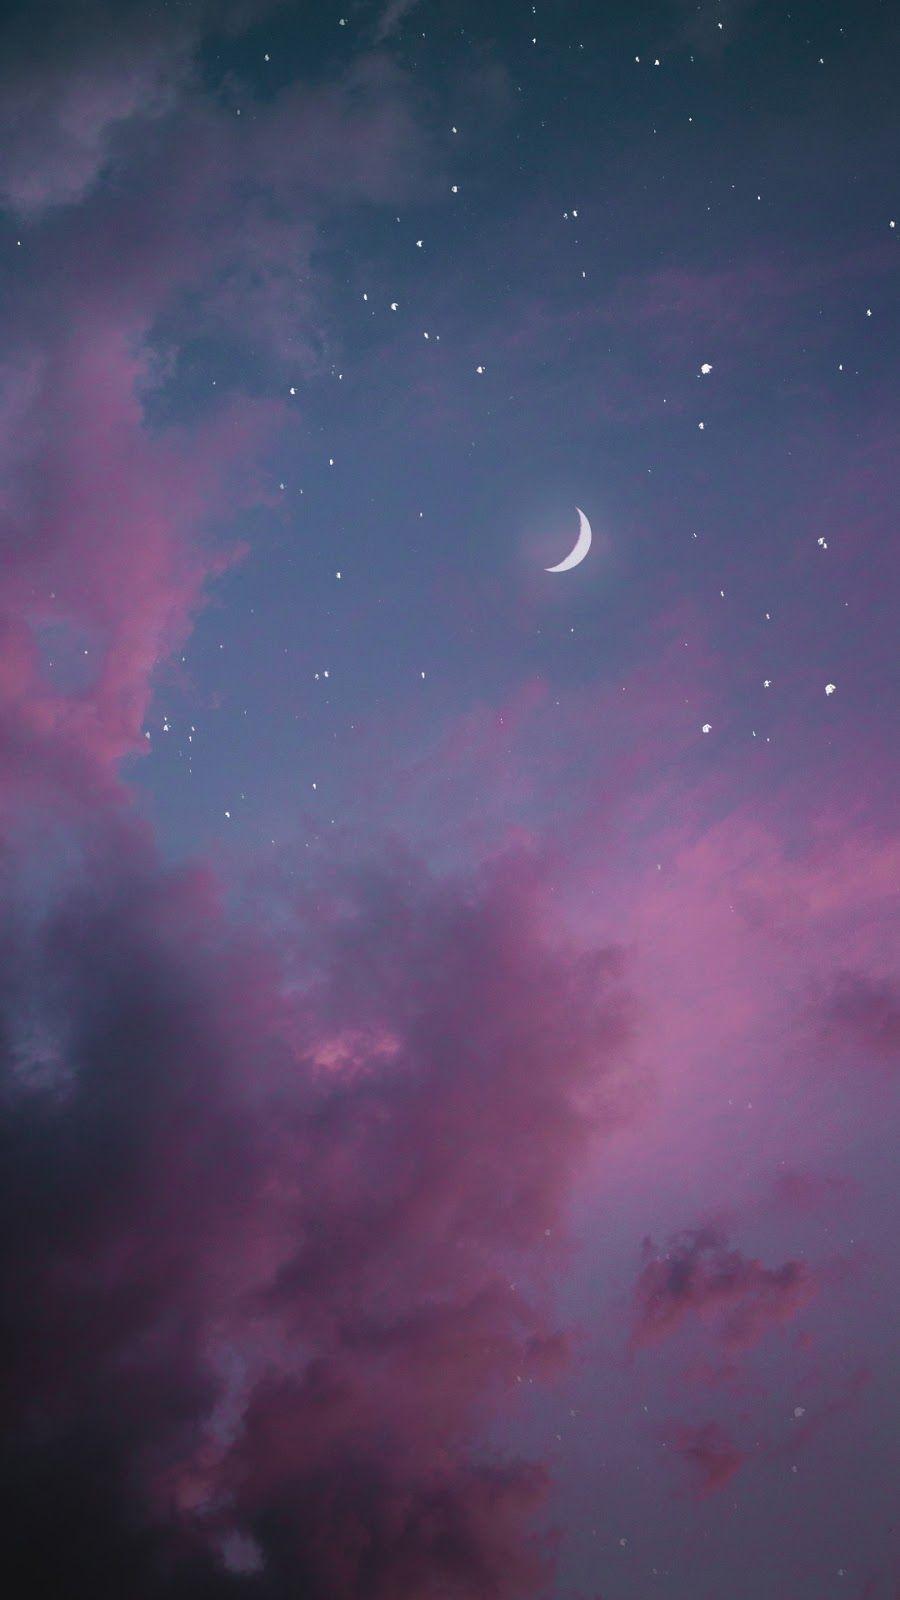 In The Night Wallpaper Night Sky Wallpaper Iphone Wallpaper Sky Pink Clouds Wallpaper